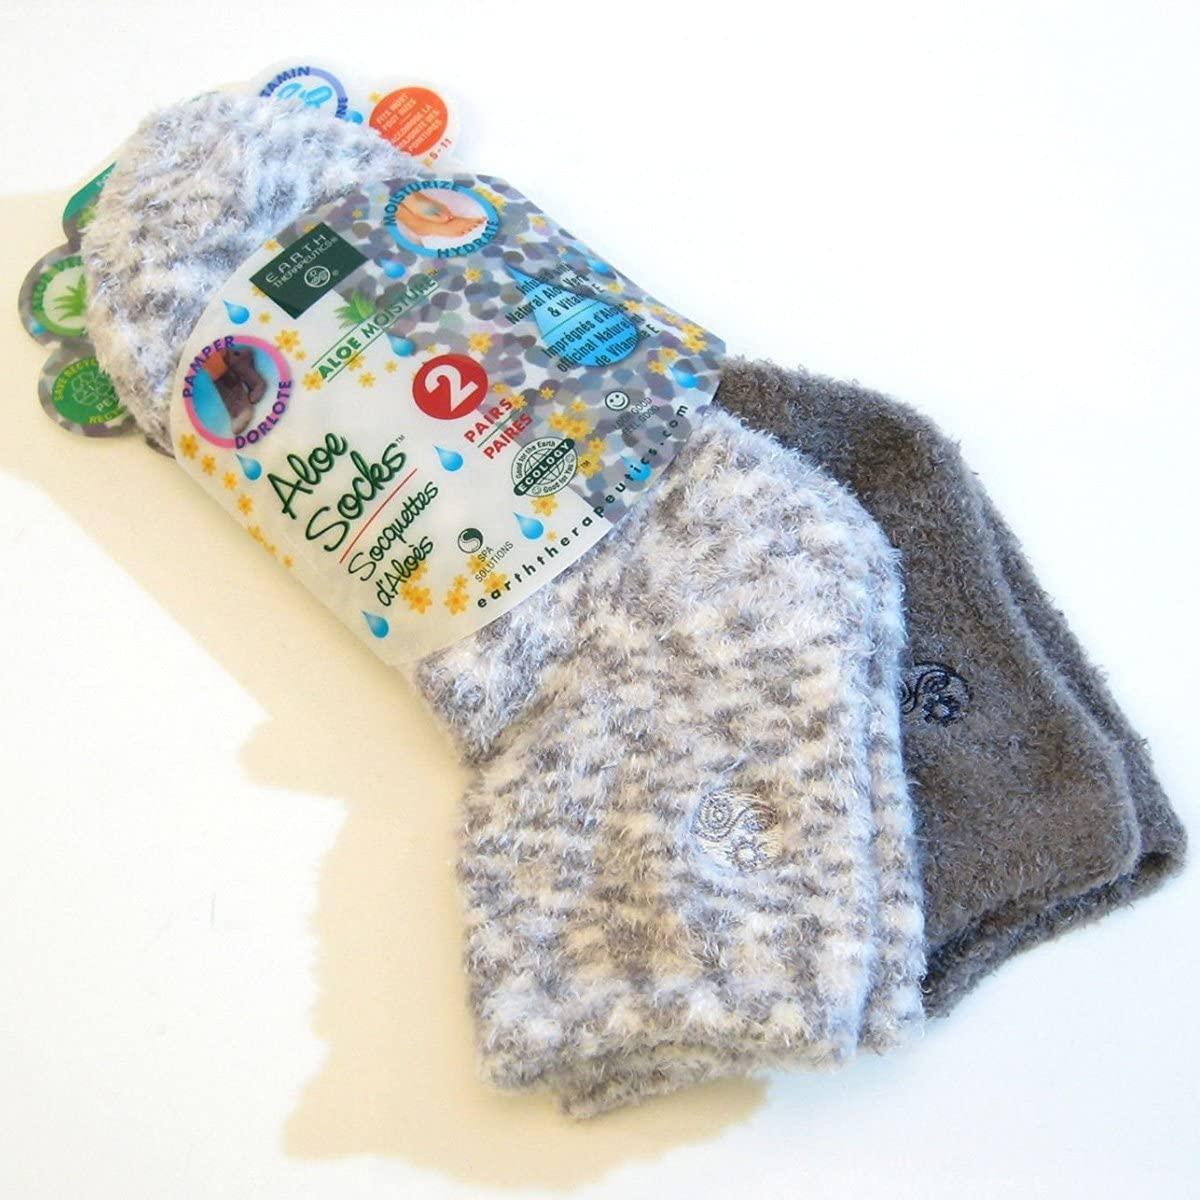 Aloe Moisture Socks by Earth Therapeutics, 2 Pack: Gray, Plaid, Infused with Natural Aloe Vera Vitamin E